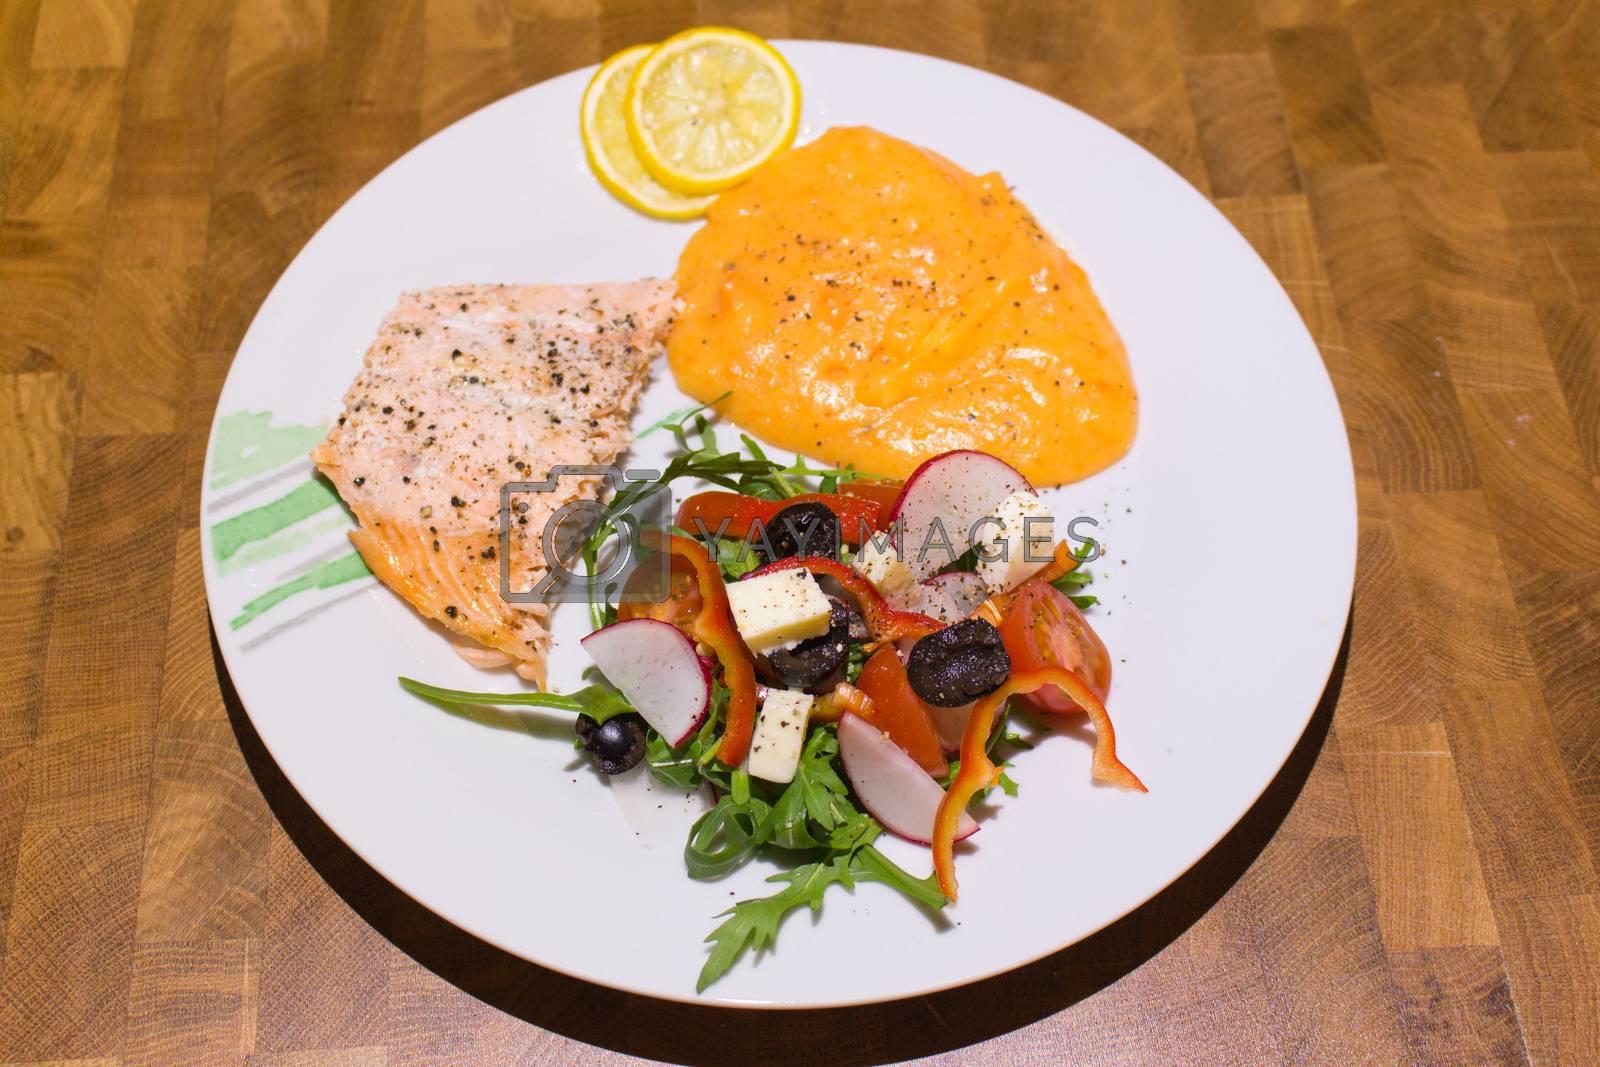 Vegetarian menu with fish home made by Robert Boss